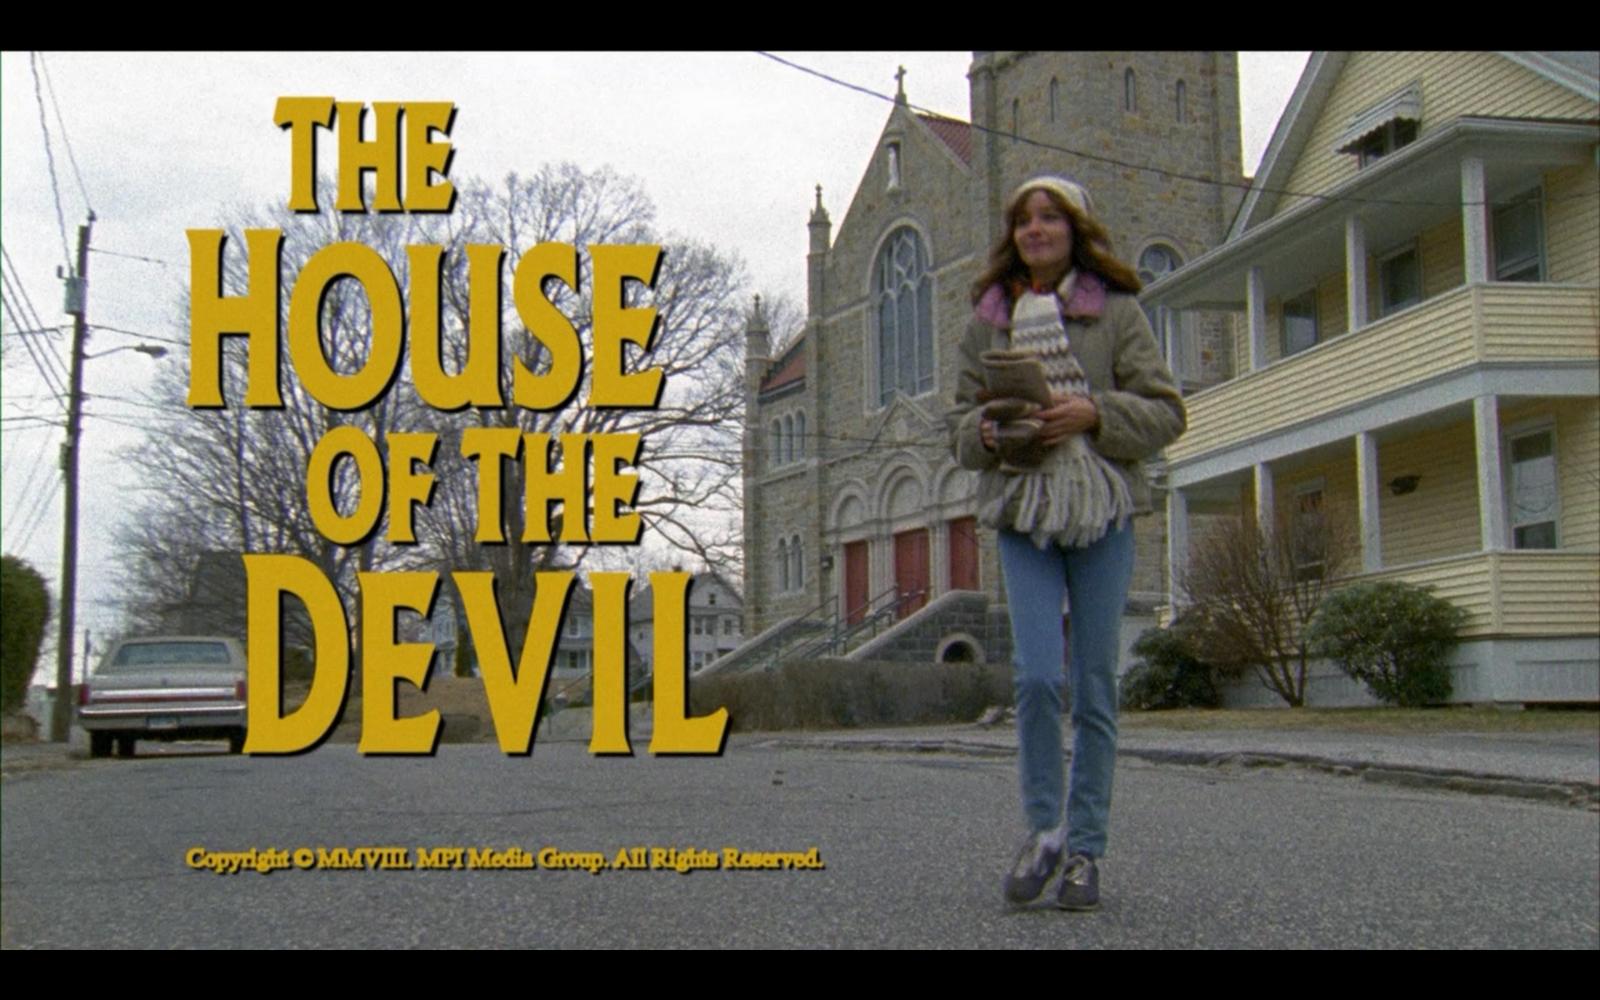 Er is geen enkele film die de sfeer van de 80's beter oproept dan 'The House of the Devil'. Absolute topper van Ti West.